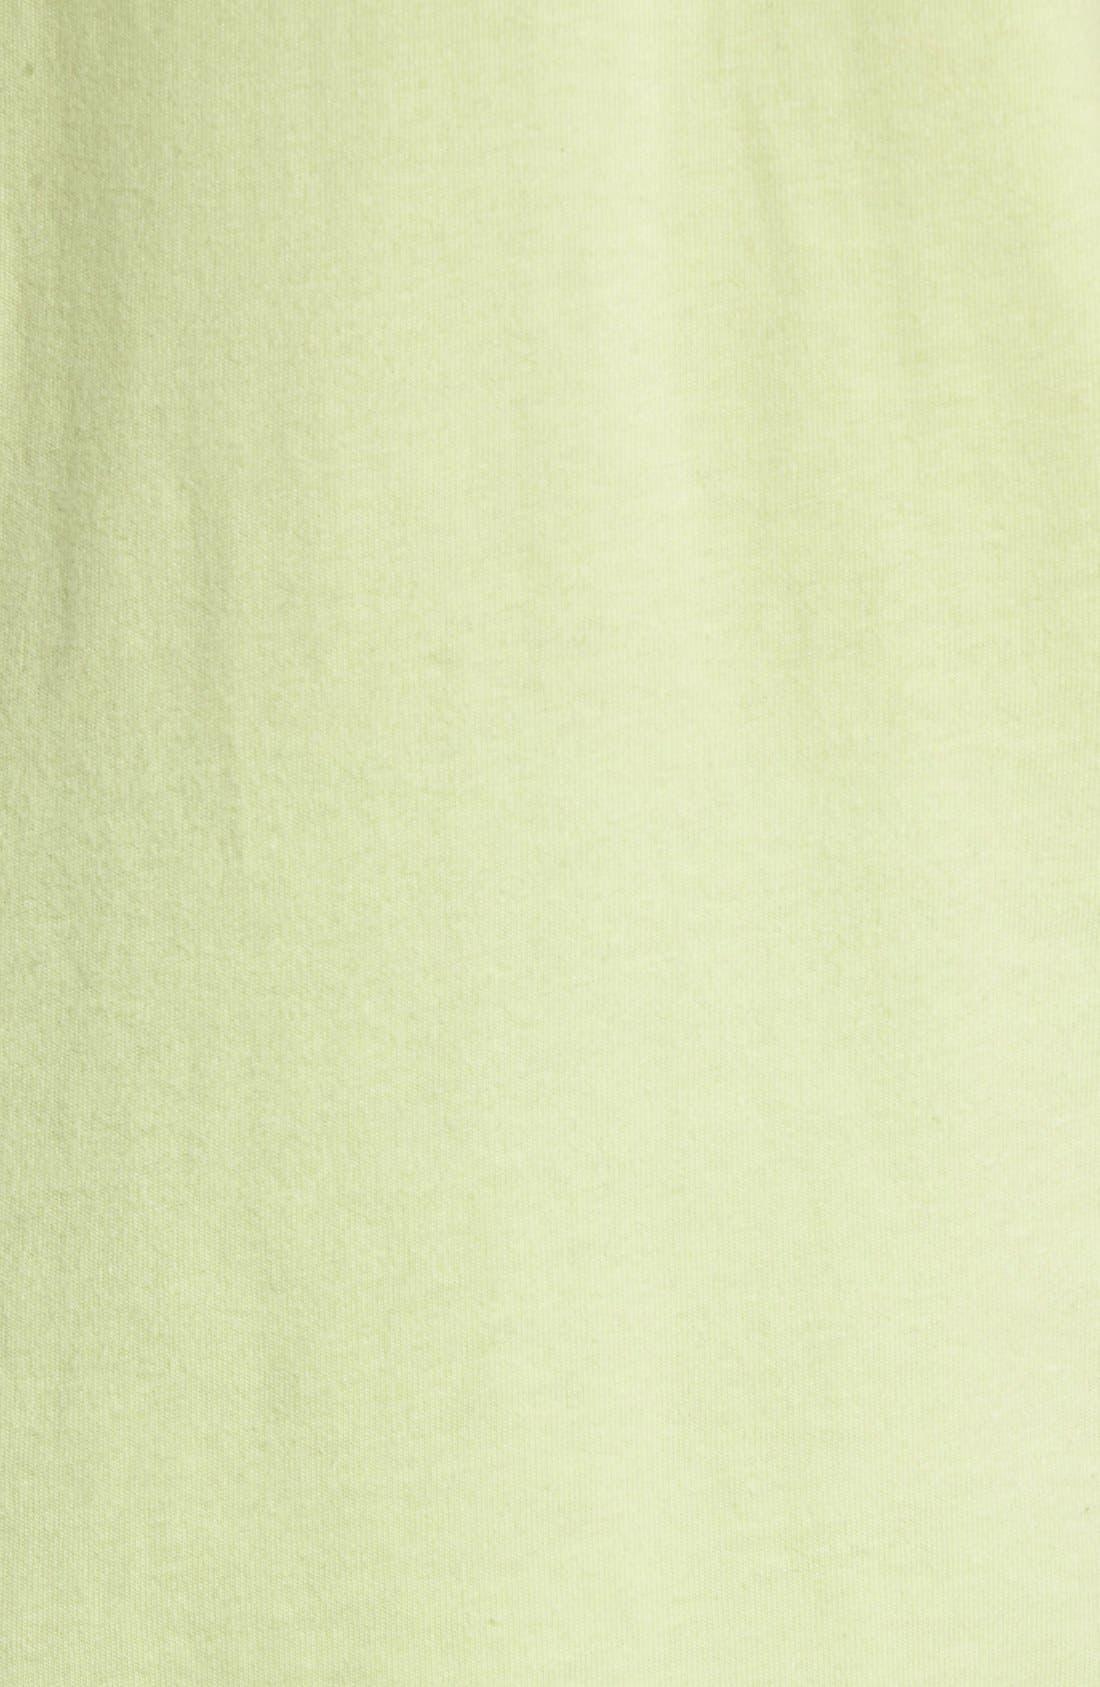 Alternate Image 5  - Tommy Bahama Keeping It Rio Graphic T-Shirt (Big & Tall)